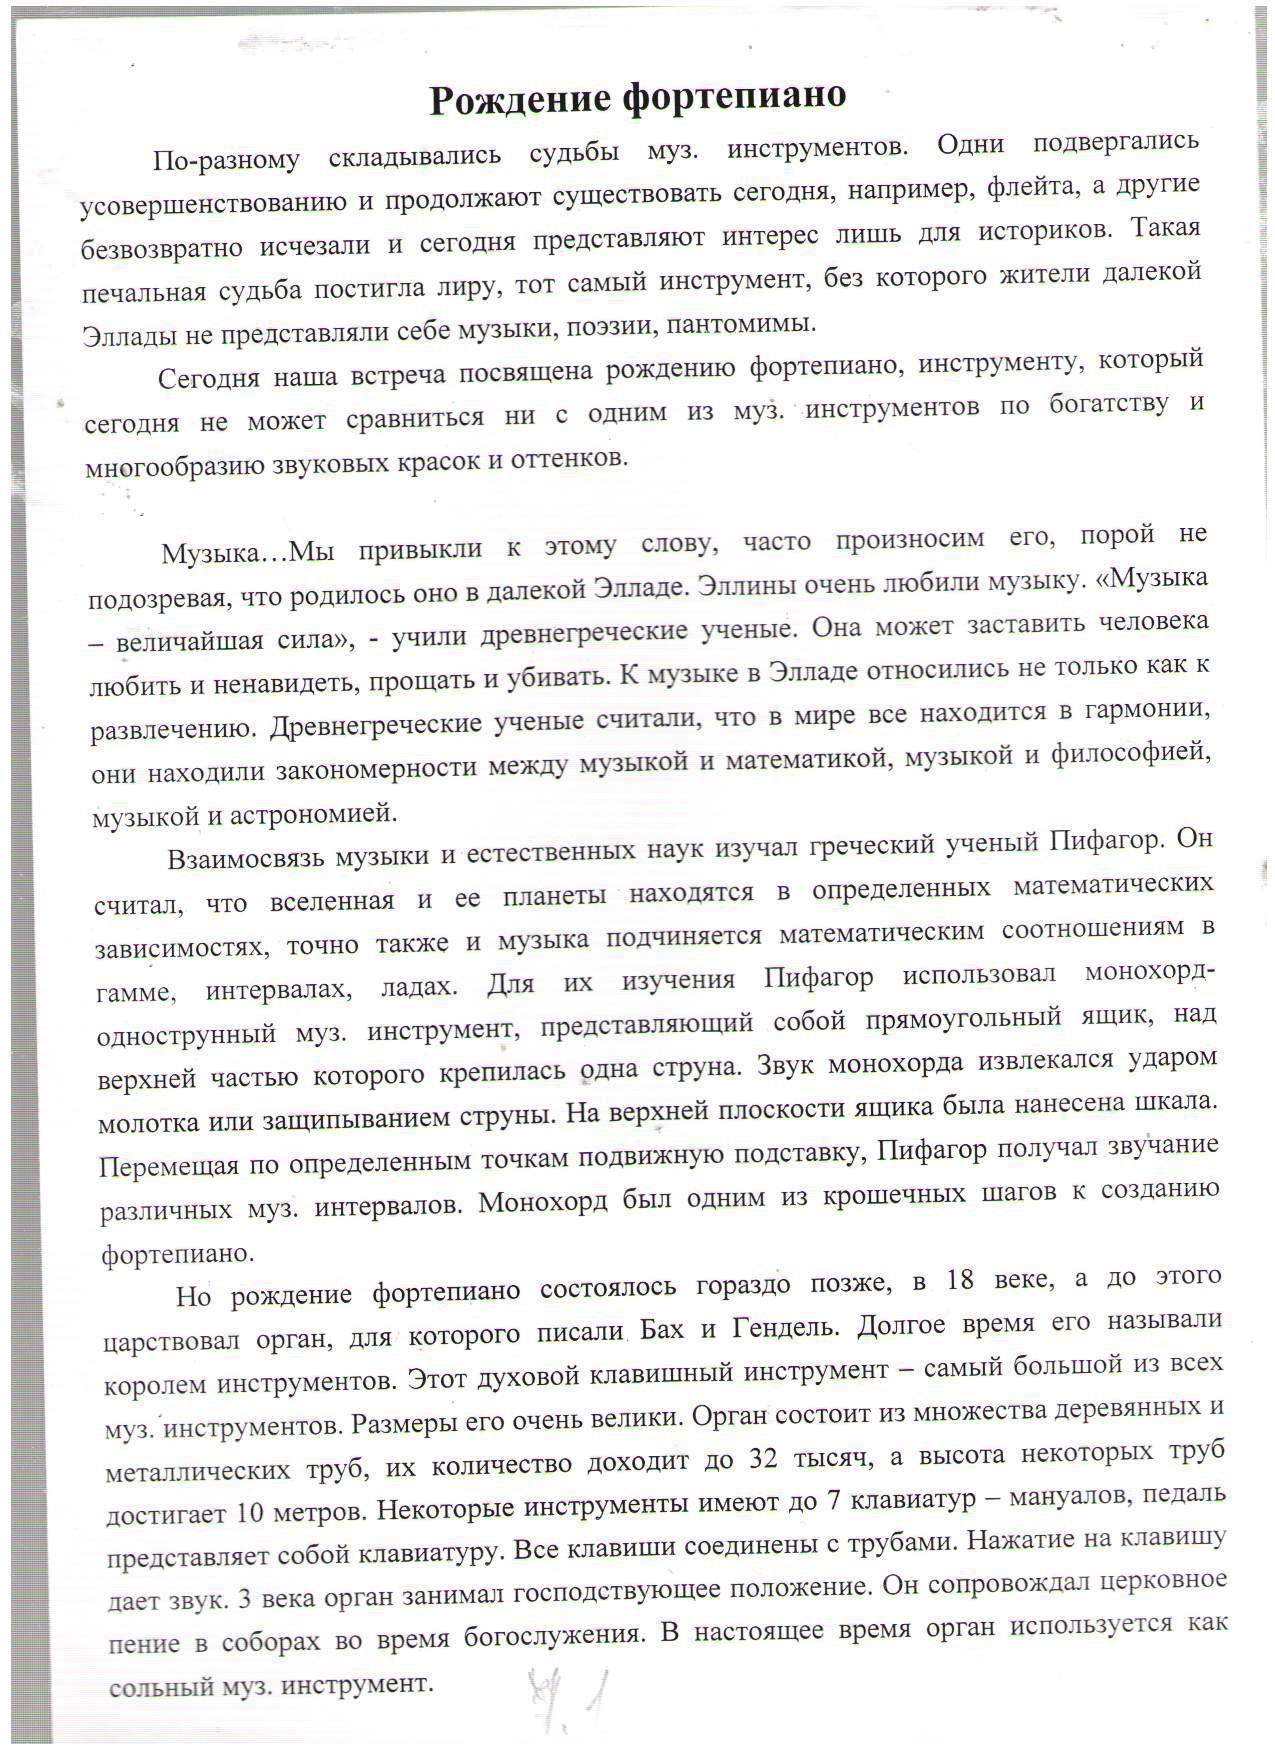 C:\Users\Нина\Desktop\Пономарева\внекл4 001.jpg